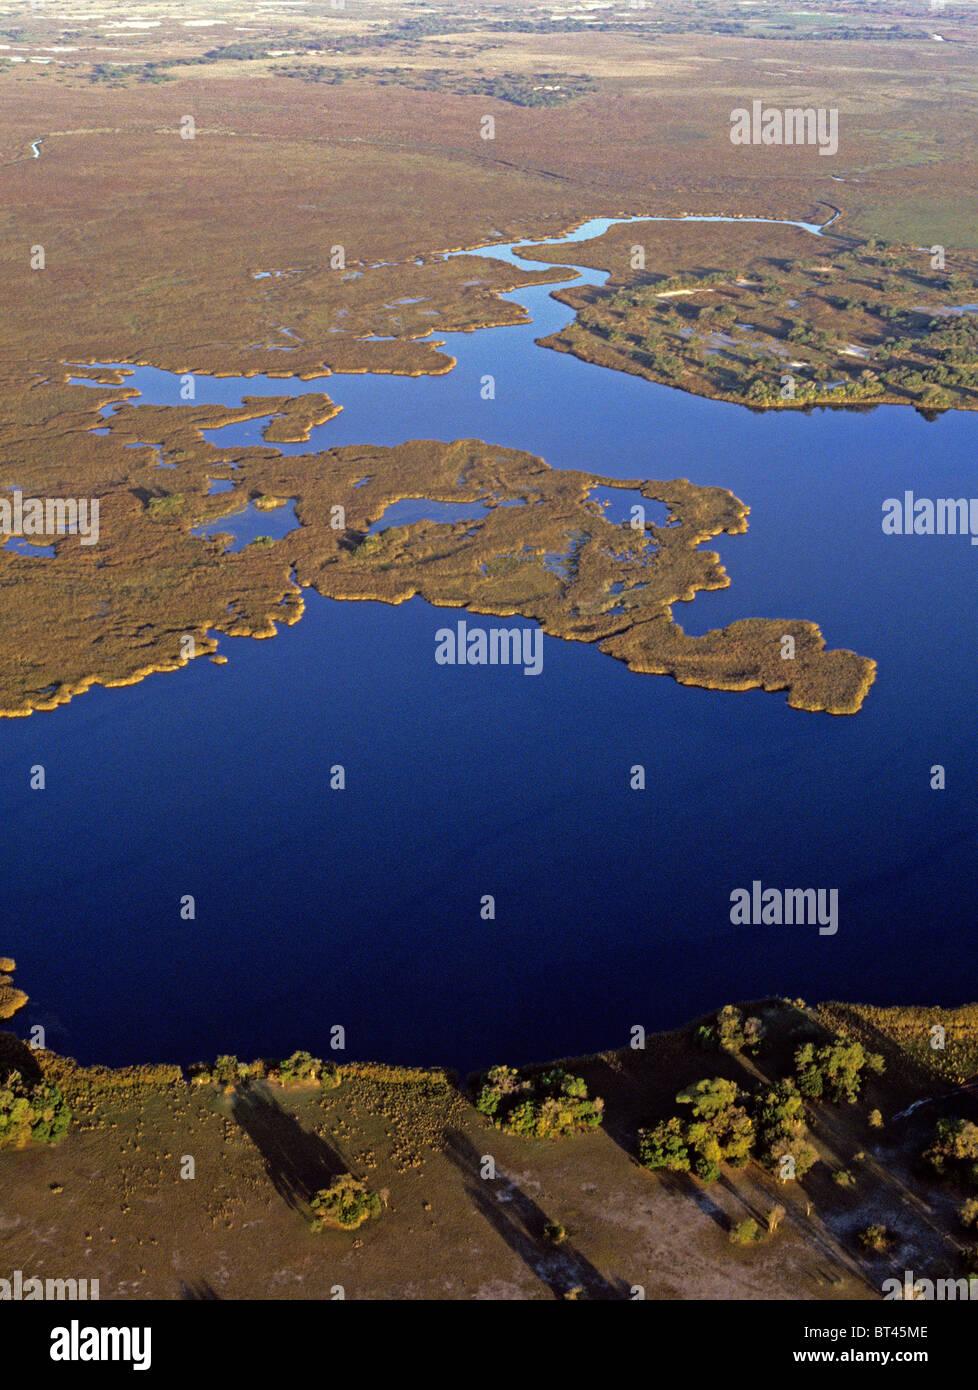 Last lagoon on the North-Western edge of the Okavango waters of Botswana - Stock Image